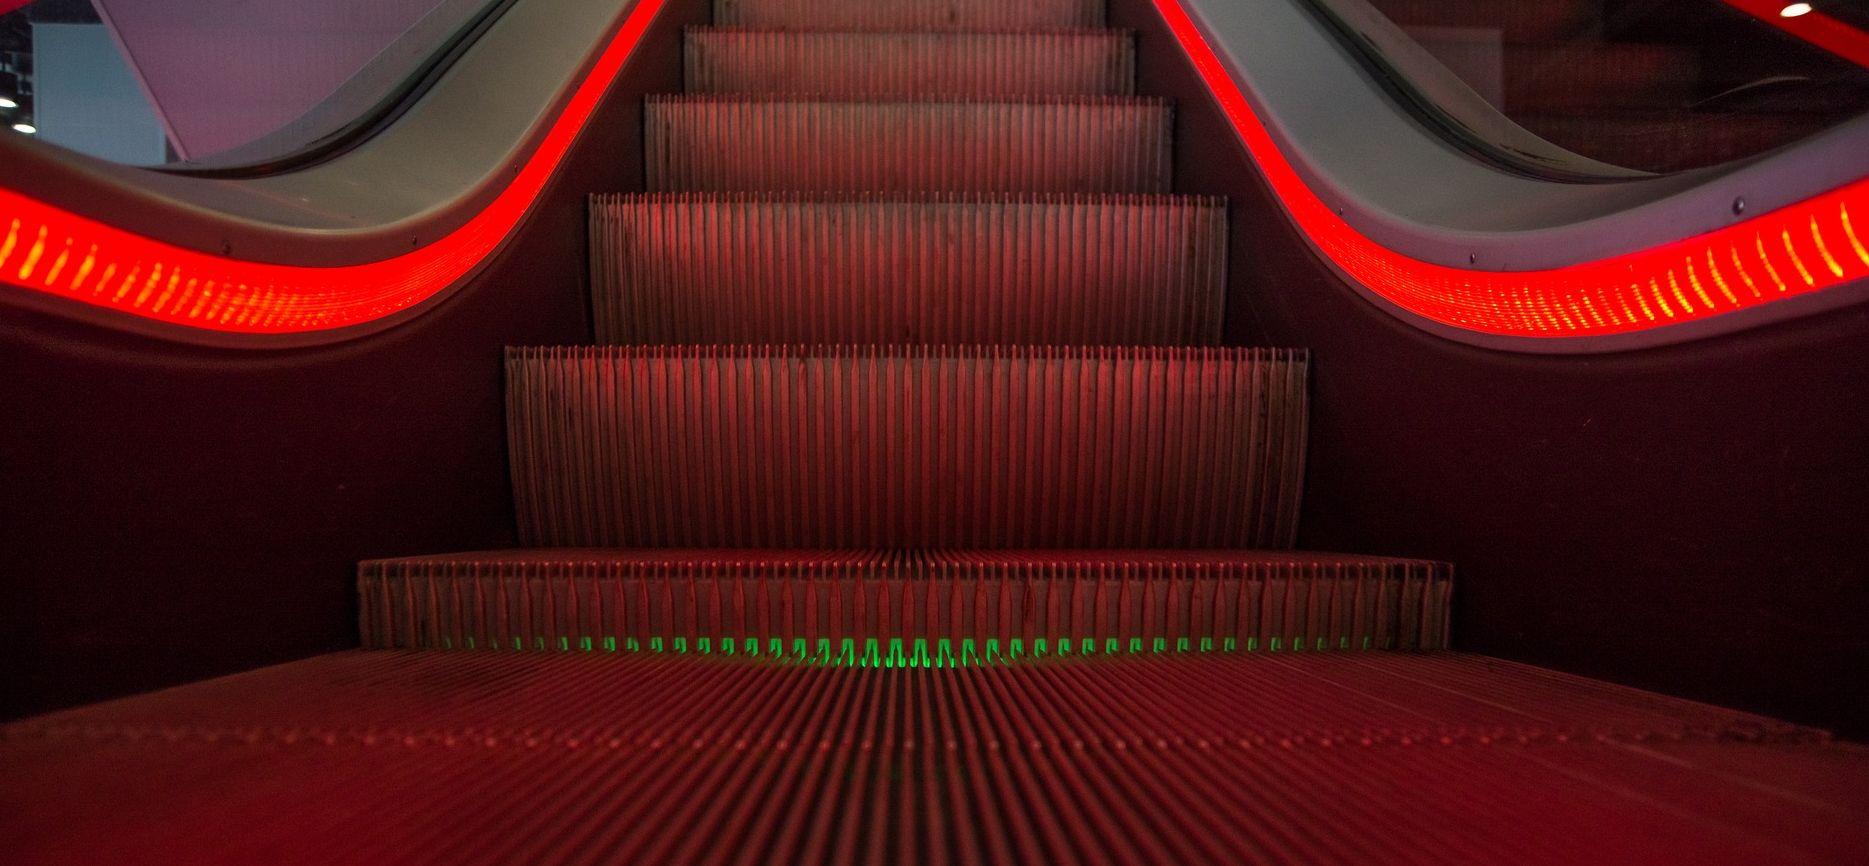 escalator-1746279_1920-Skitterphoto.jpg